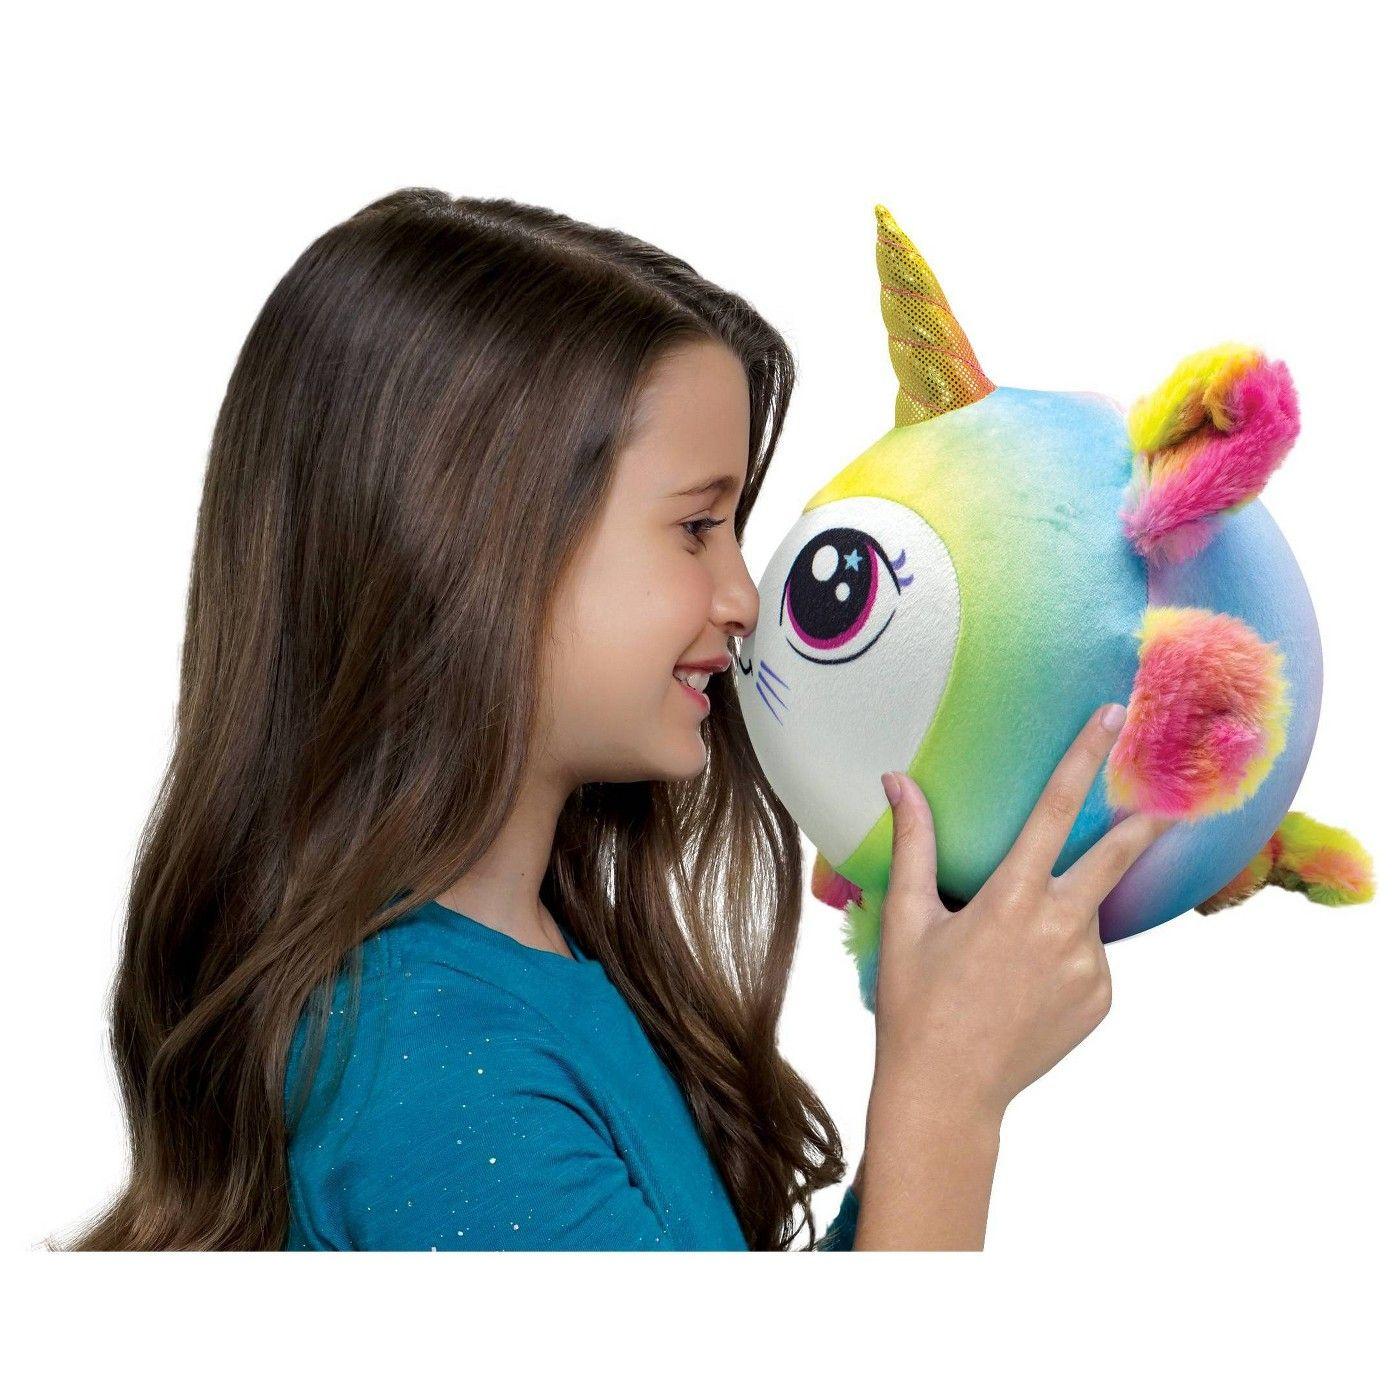 Wubble Kitty Fuzzy Corn Affiliate Kitty Ad Wubble Corn In 2020 Unicorn Stuffed Animal Cute Stuffed Animals Animals